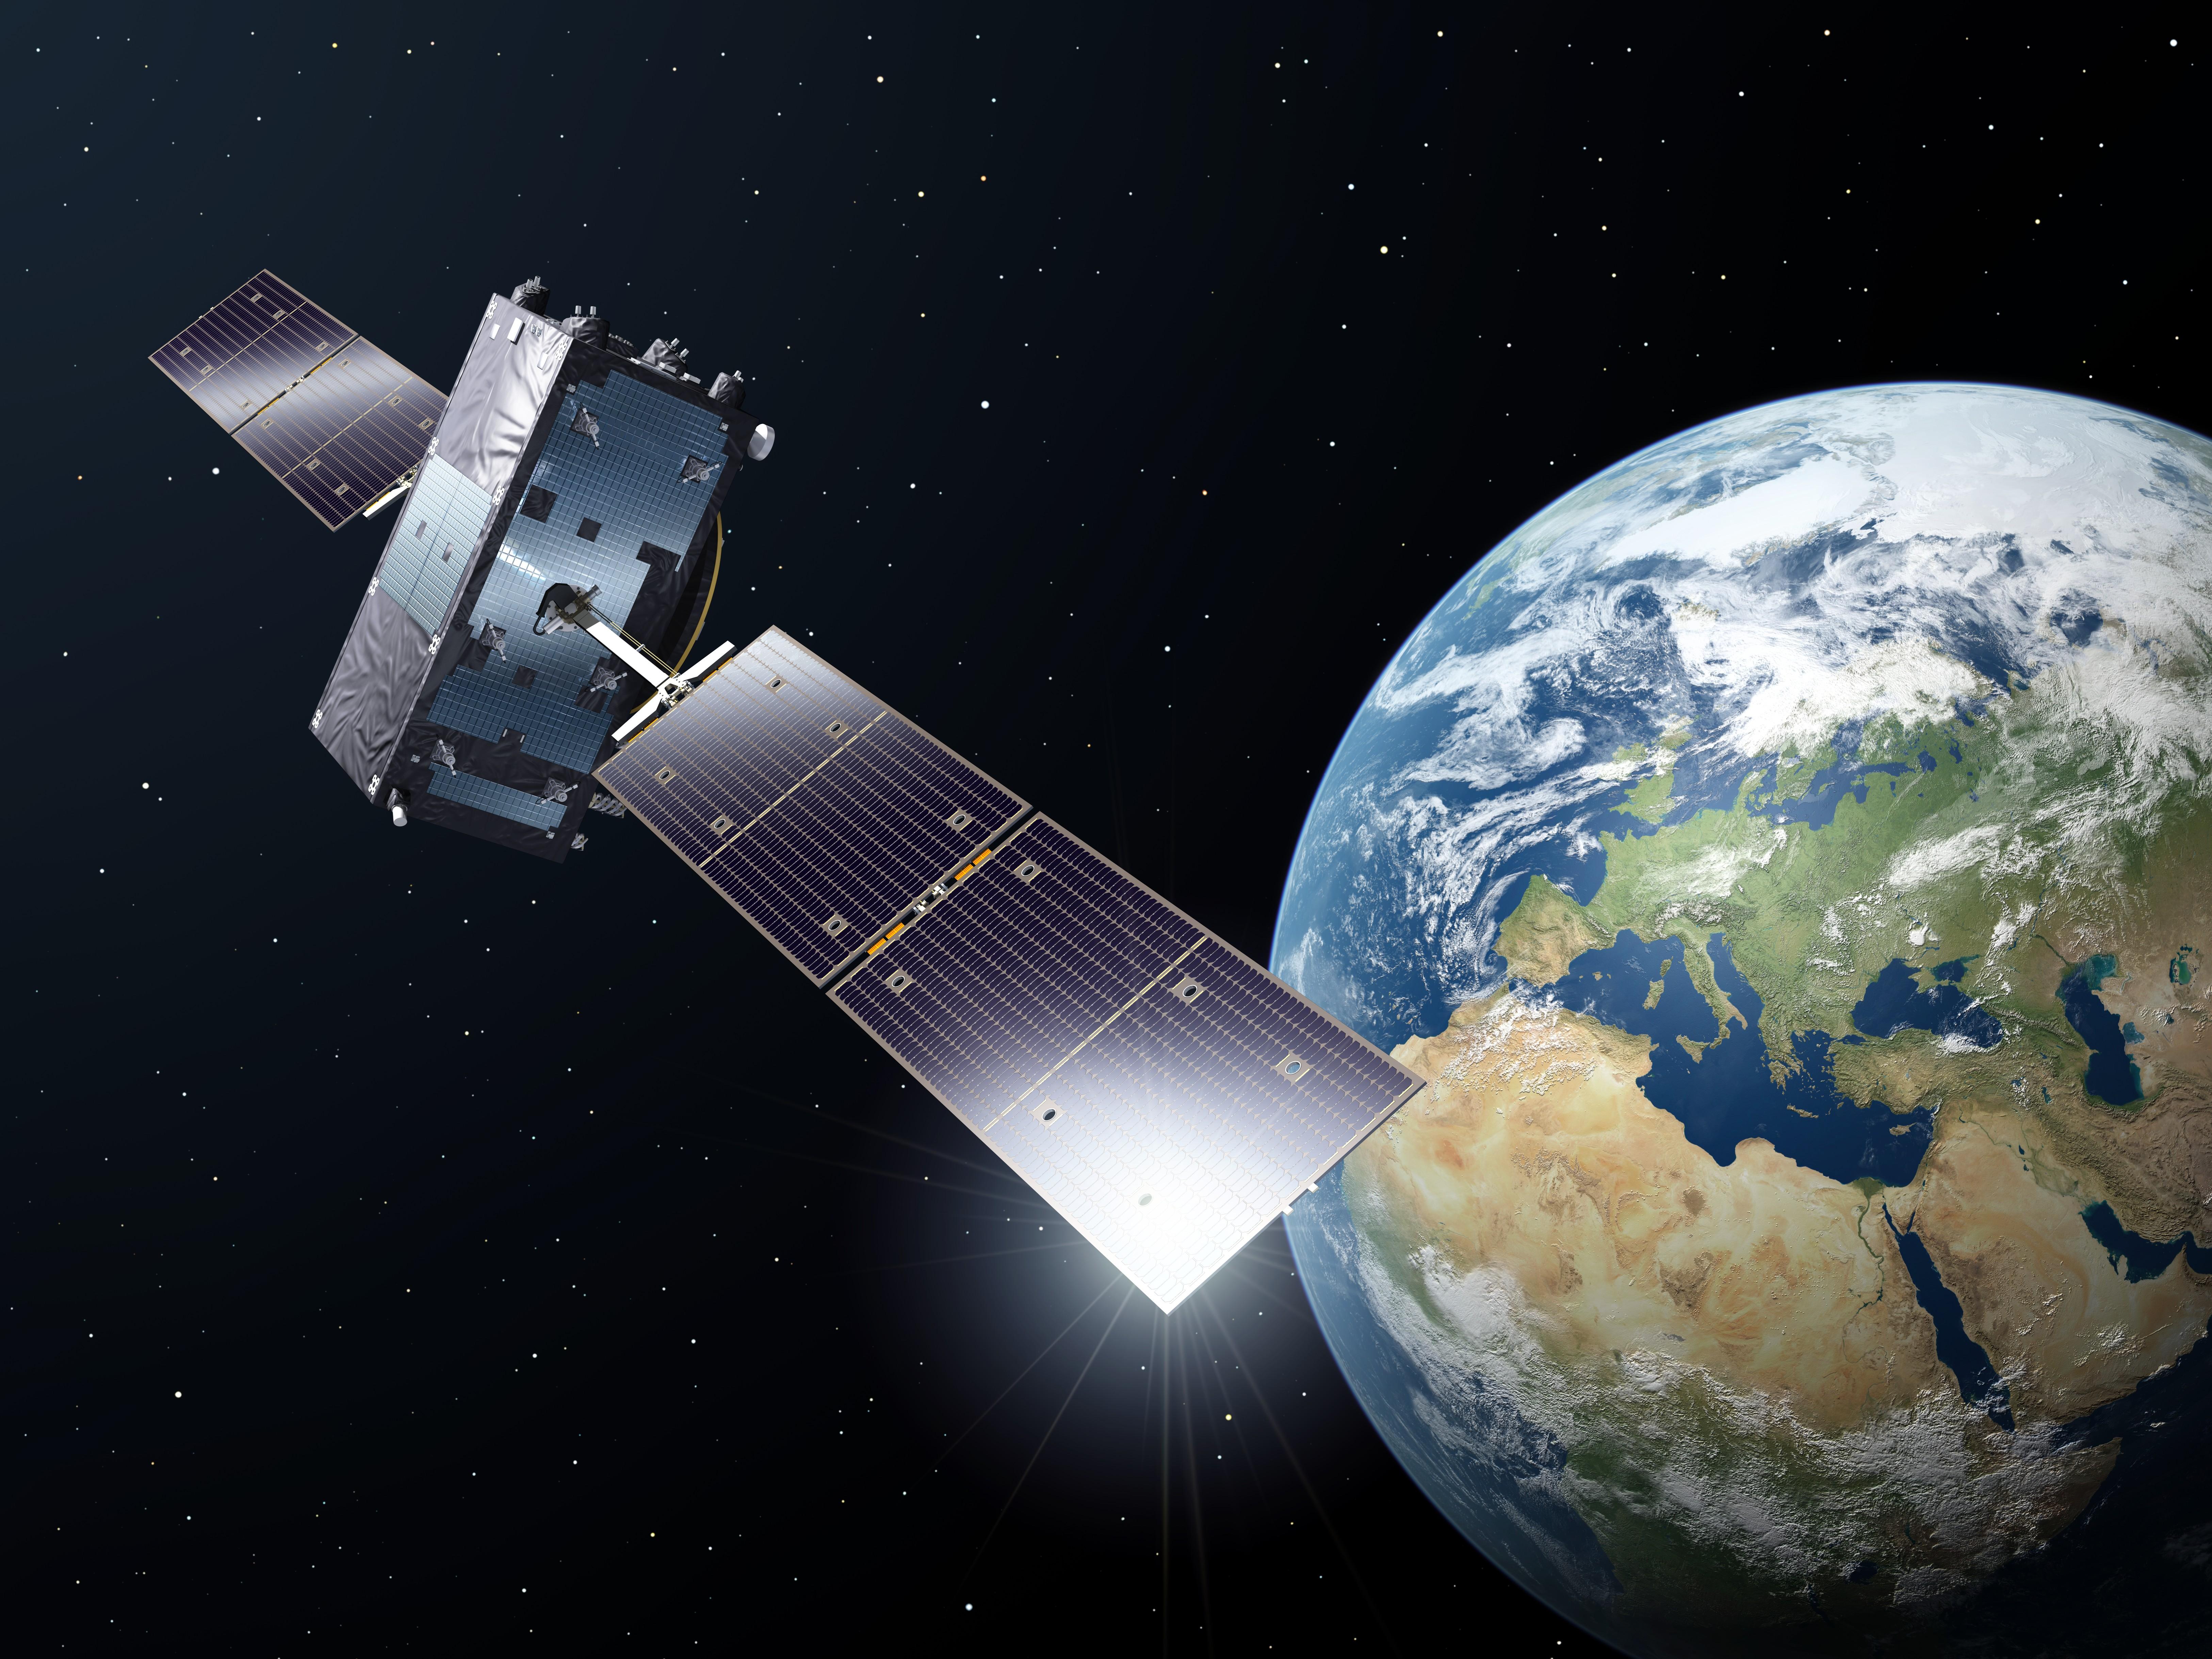 Satellite Set For New Orbit - Google satellite images